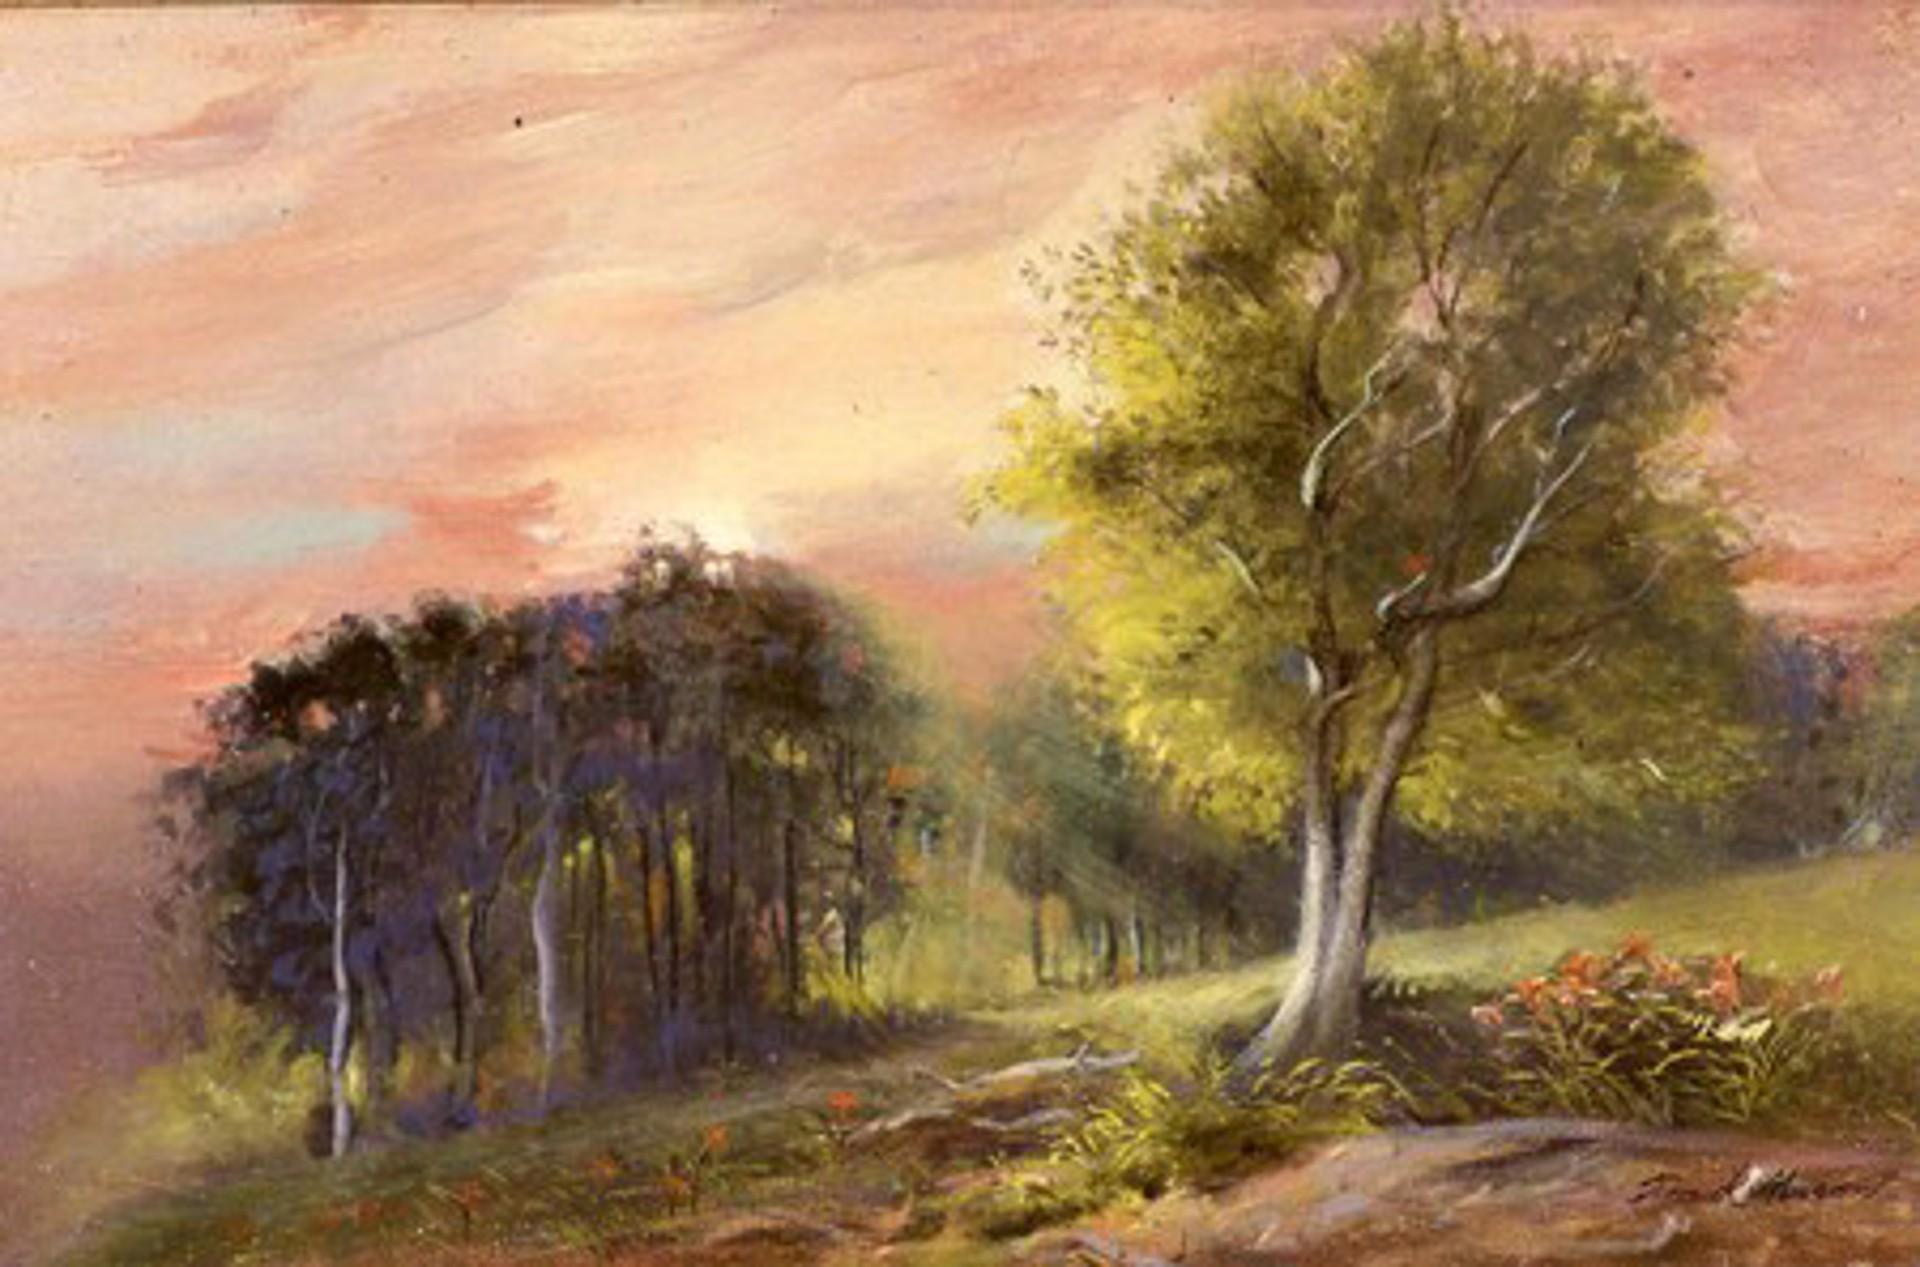 Early Sunrise, Stowe by Frank Mason (1921 - 2009)